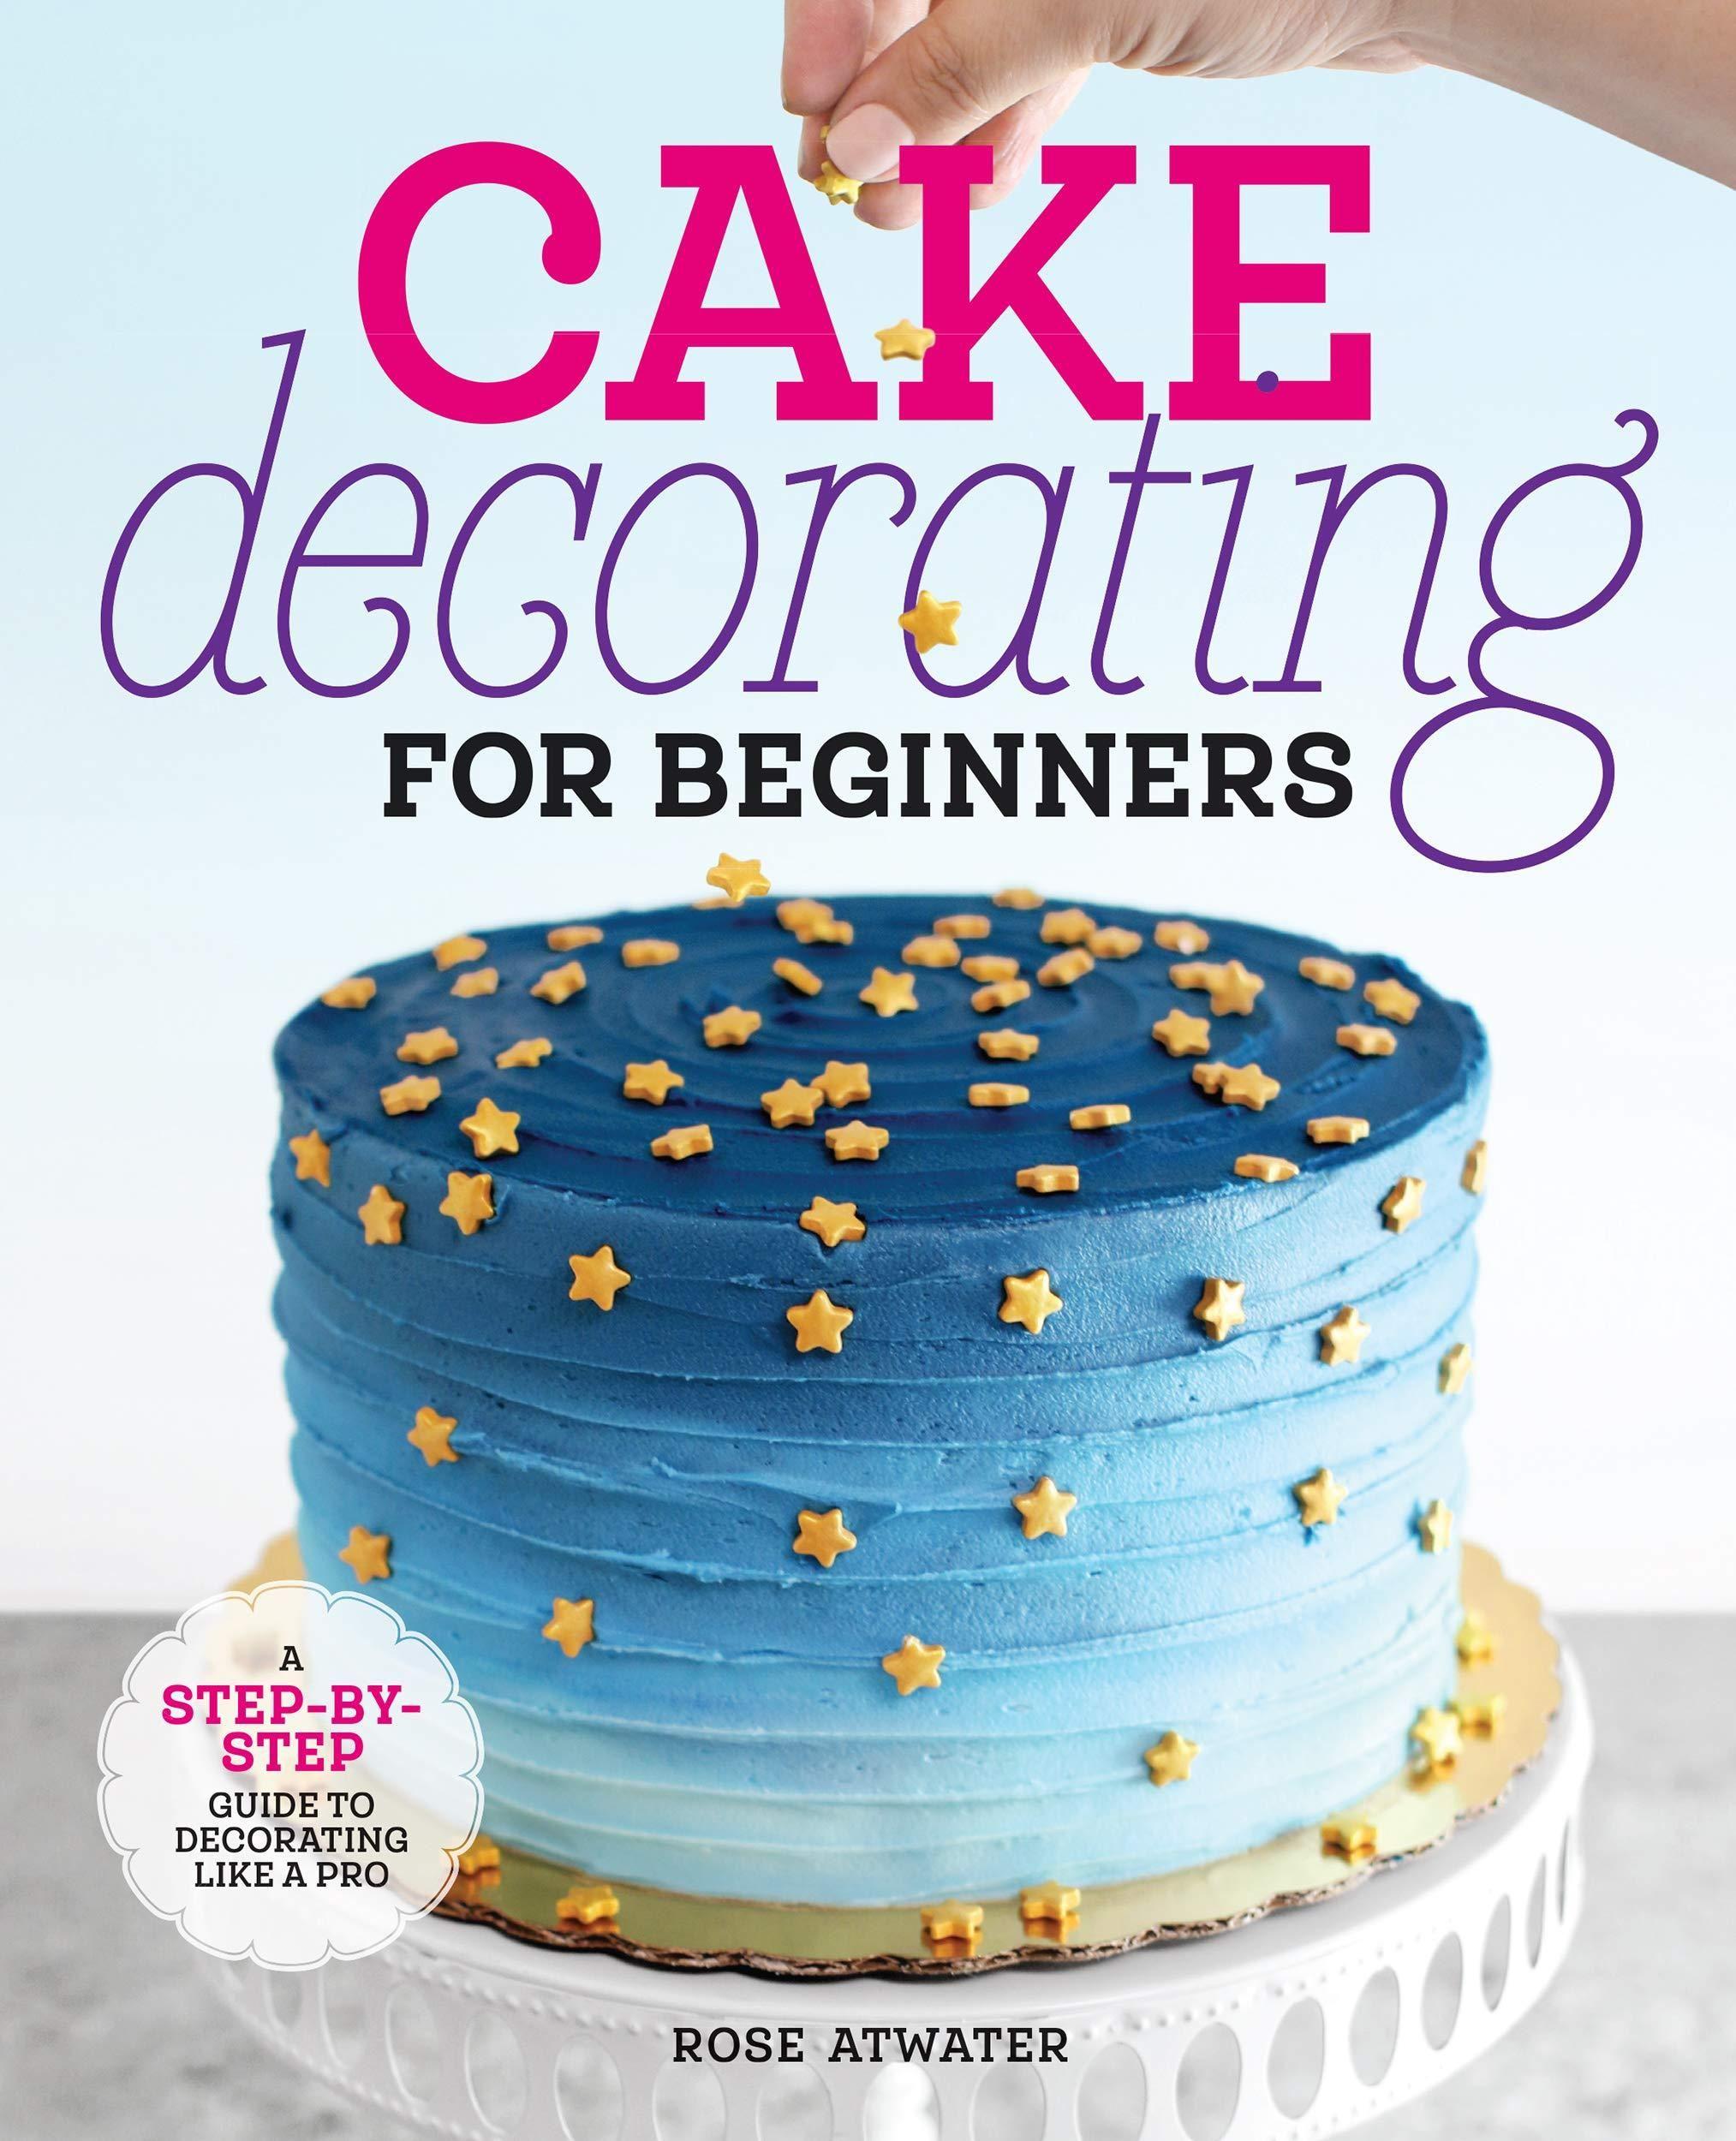 Pdf Download Cake Decorating For Beginners A Step By Step Guide To In 2020 Geburtstag Ideen Geburtstag Geburt